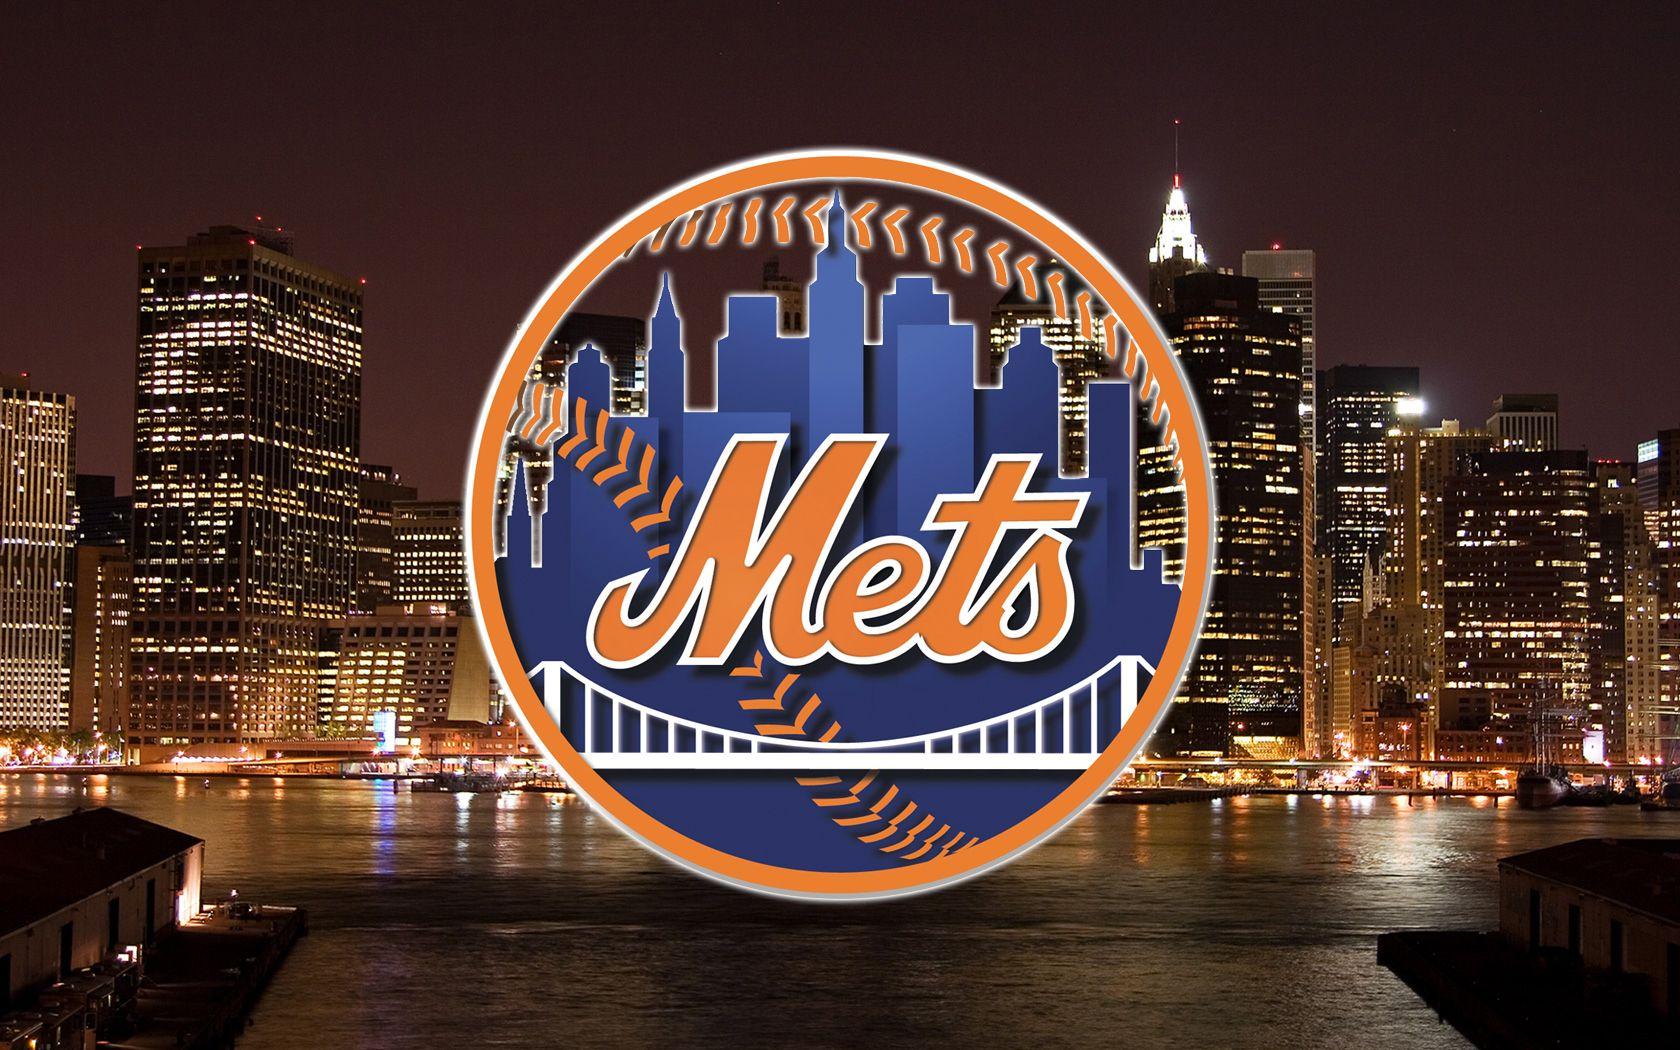 New york mets new york mets pinterest mets baseball and meet the mets meet the mets step right up and greet the mets kristyandbryce Gallery